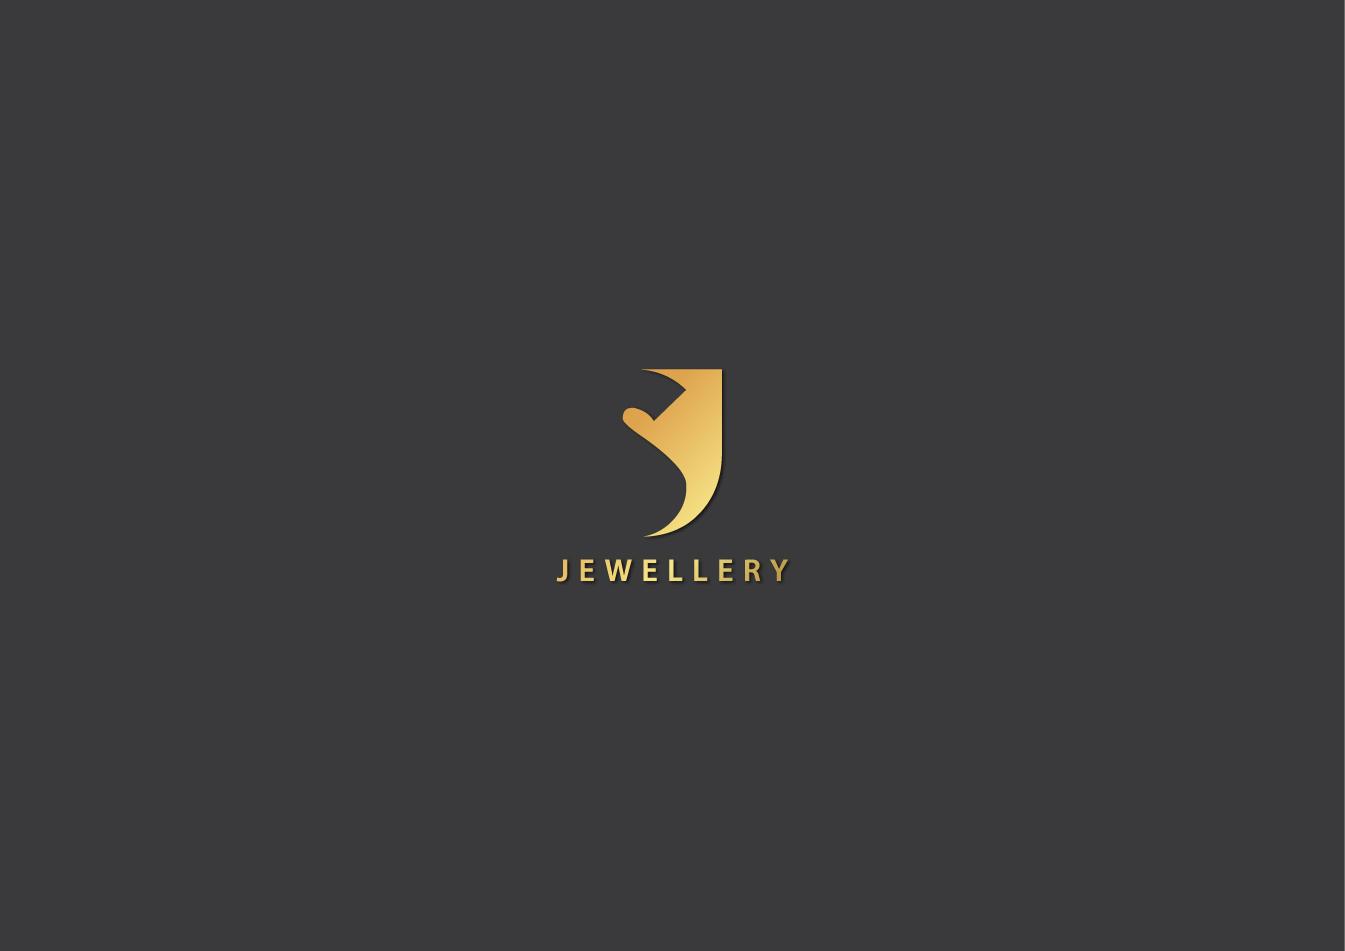 business logo design for sj jewellery by crazy art design 3733896